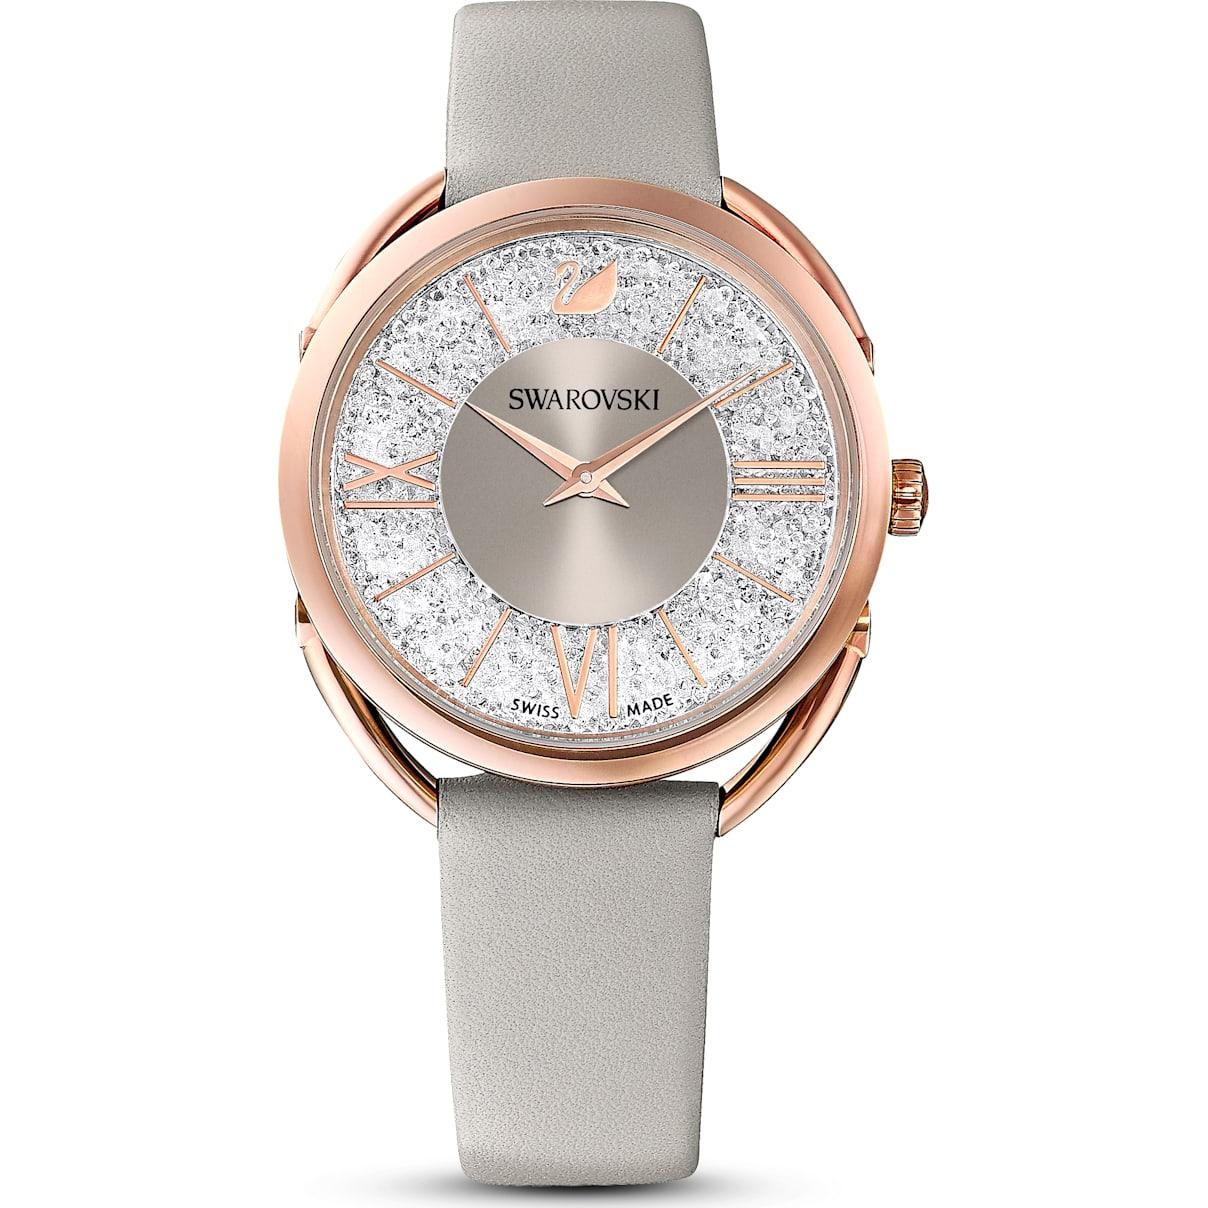 Swarovski Crystalline Glam Watch, Leather Strap, Gray, Rose-gold tone PVD